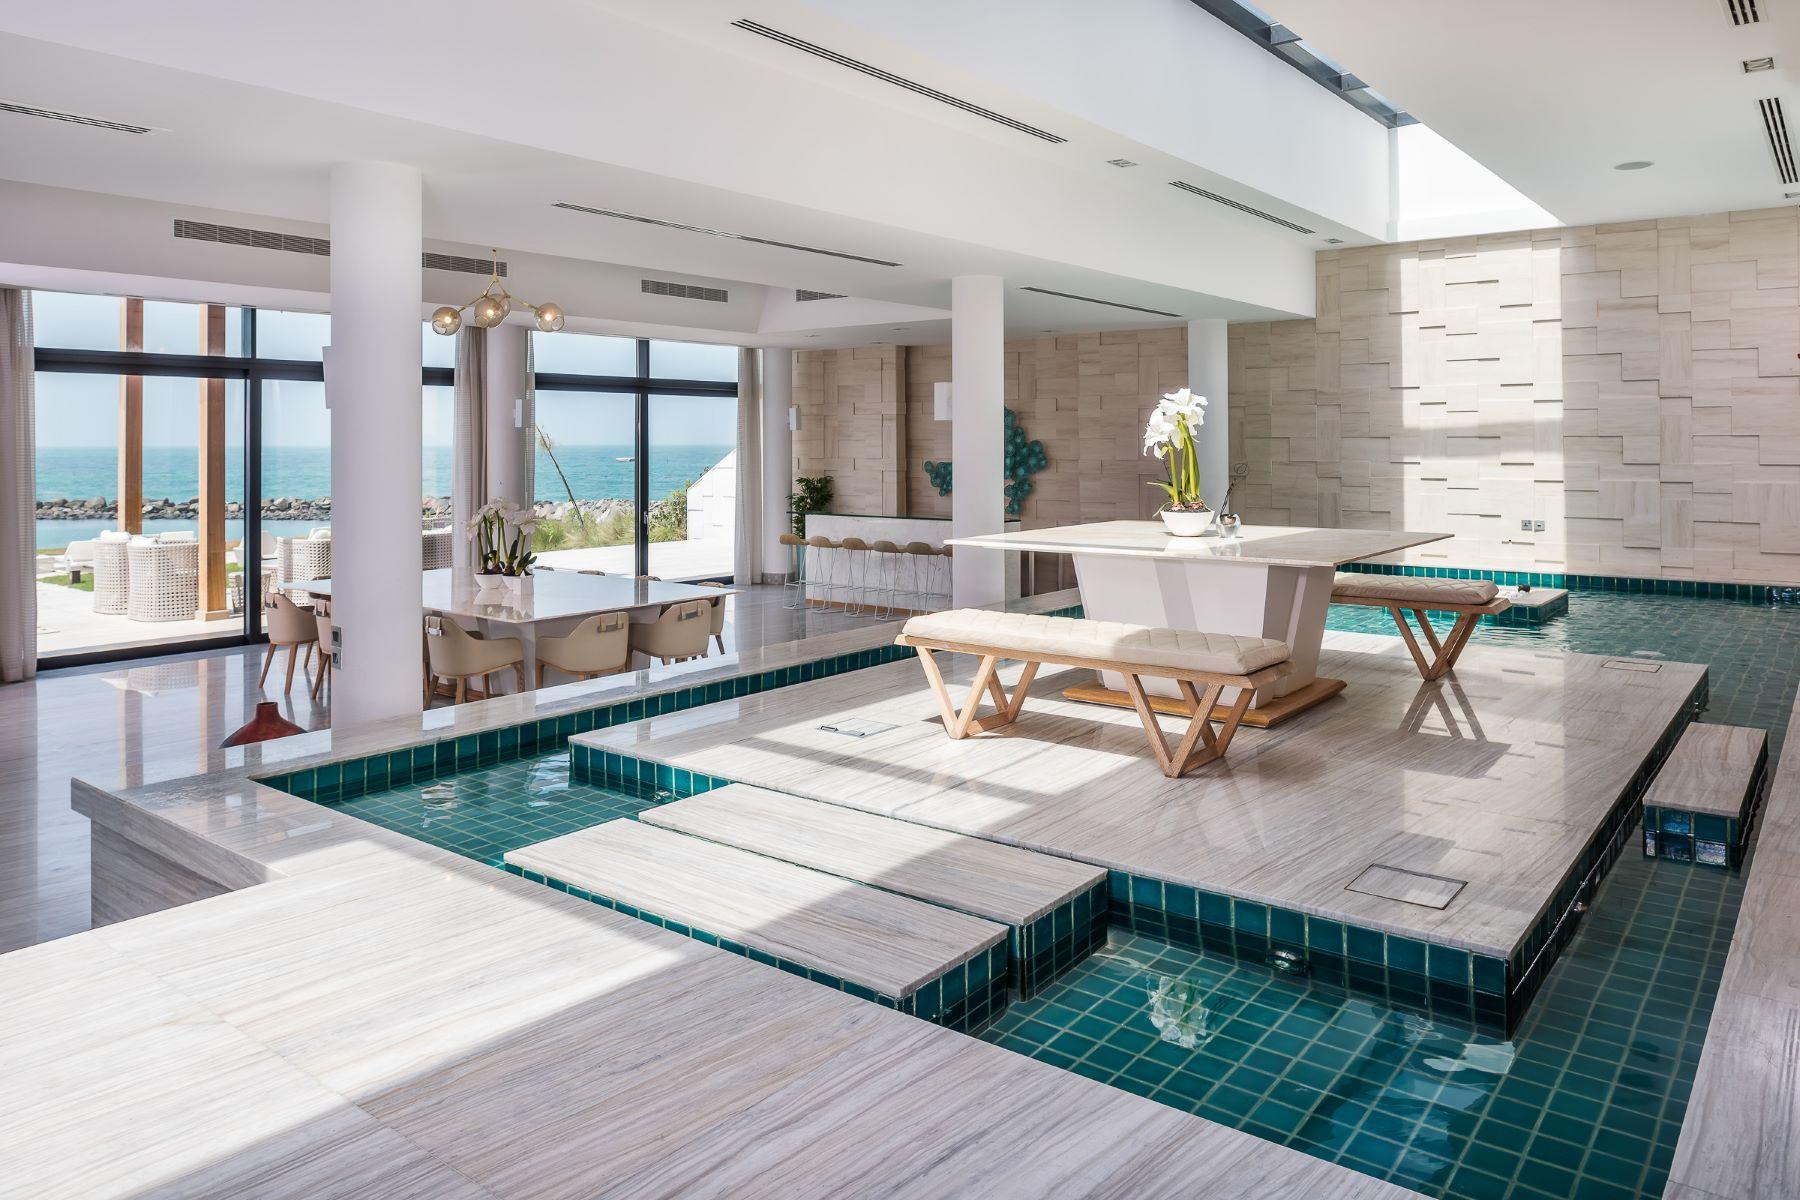 Single Family Home for Sale at Stunning Beach Front Estate Villa Nurai Island, Abu Dhabi, United Arab Emirates